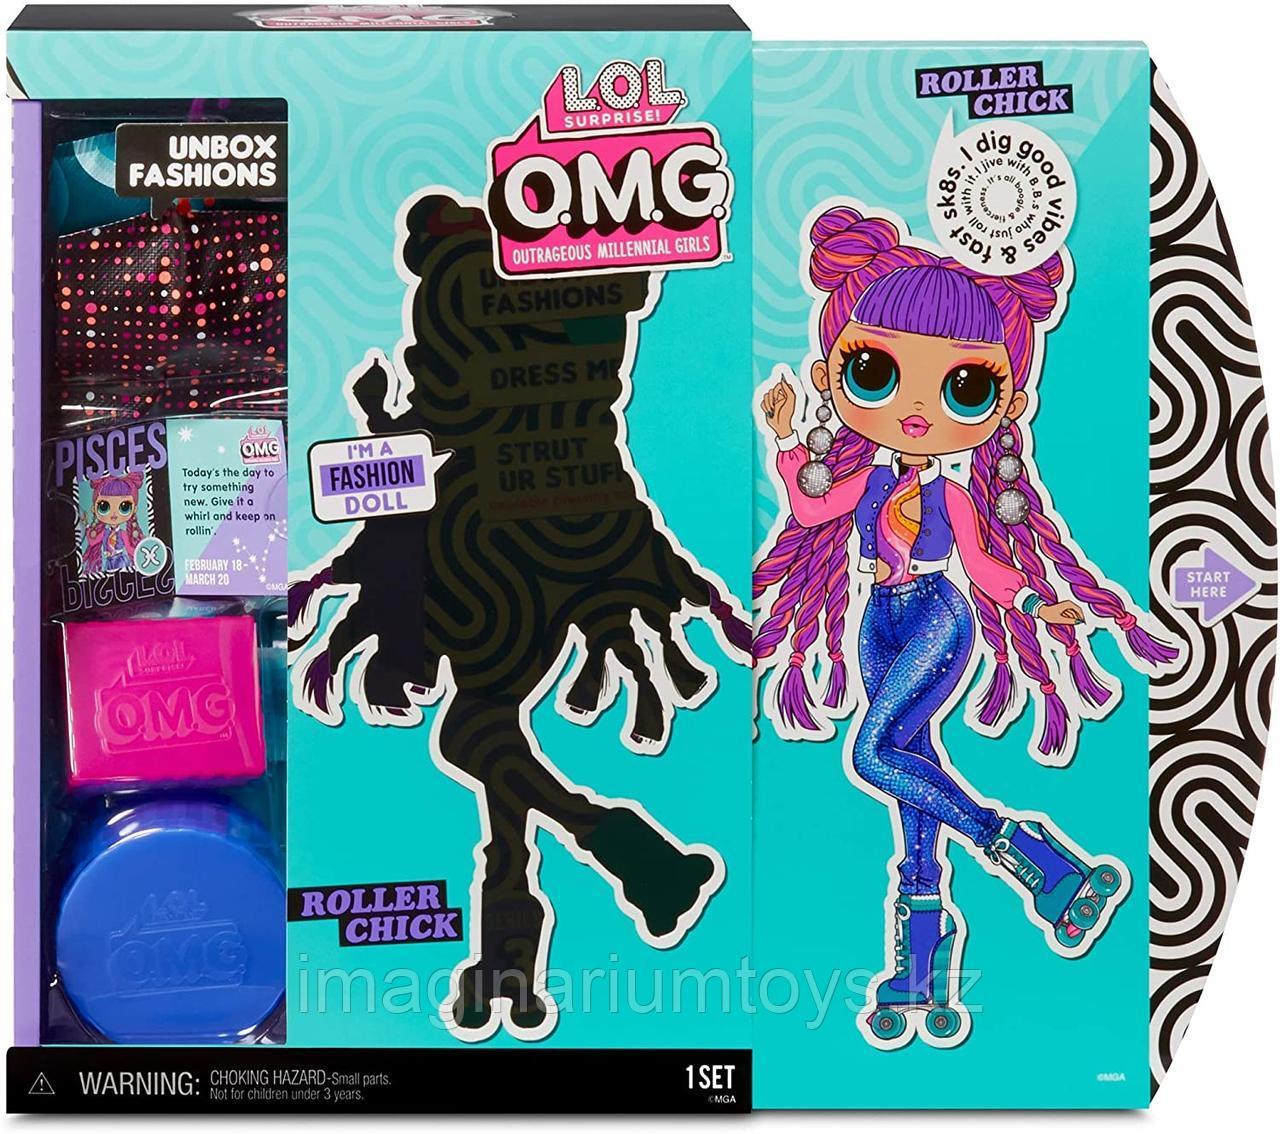 LOL Surprise OMG 3 серия Большая кукла ЛОЛ Roller Chick - фото 5